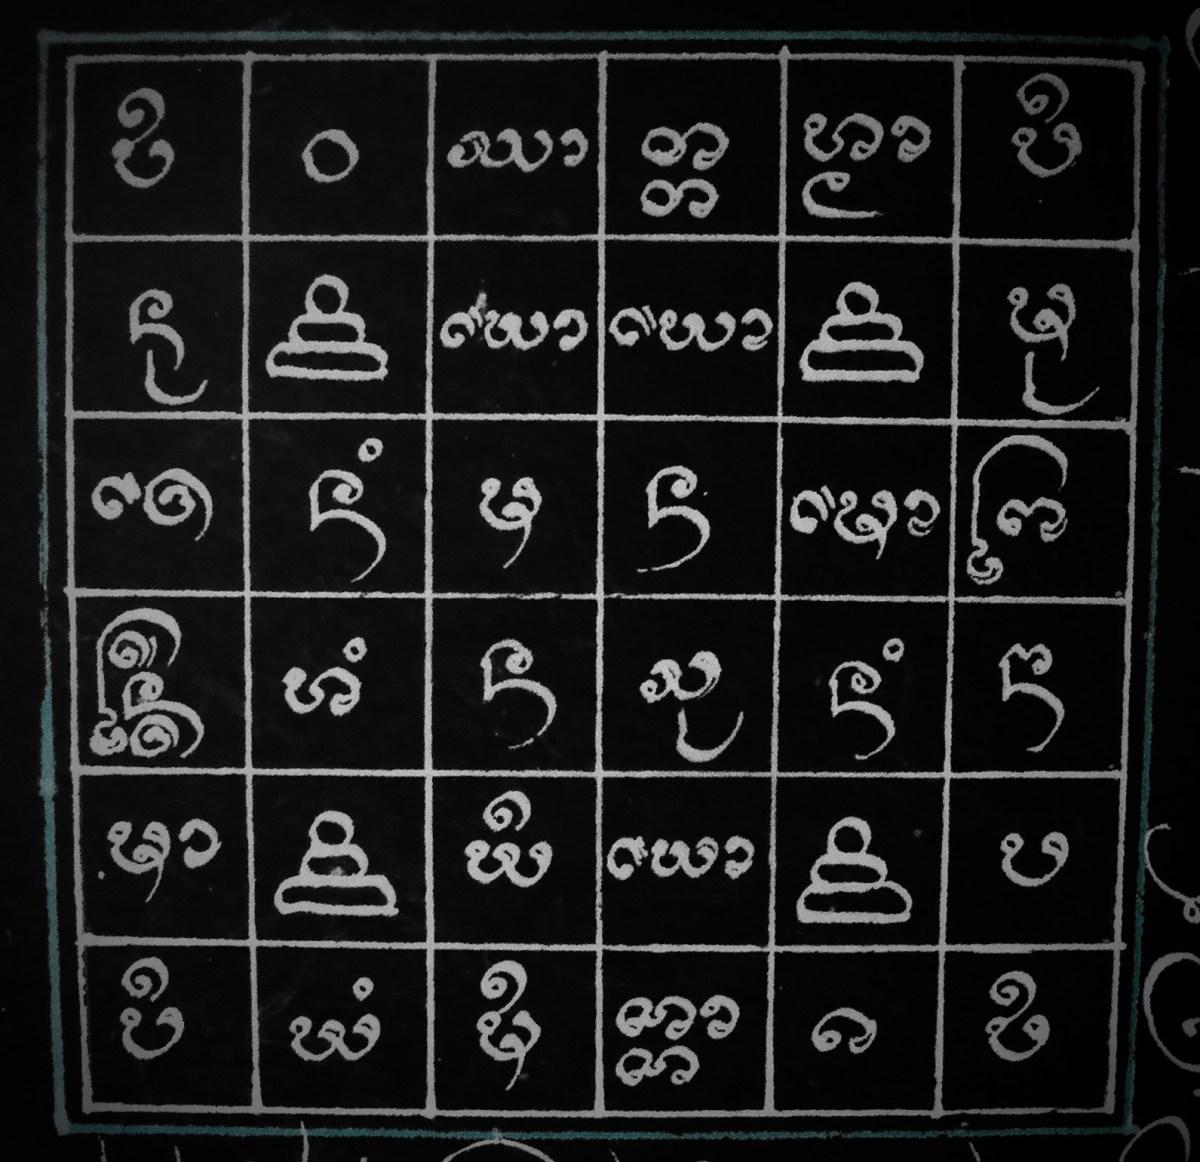 Yant Dork Mai Mueang Sawan (Flower of the Celestial Realms Yantra)